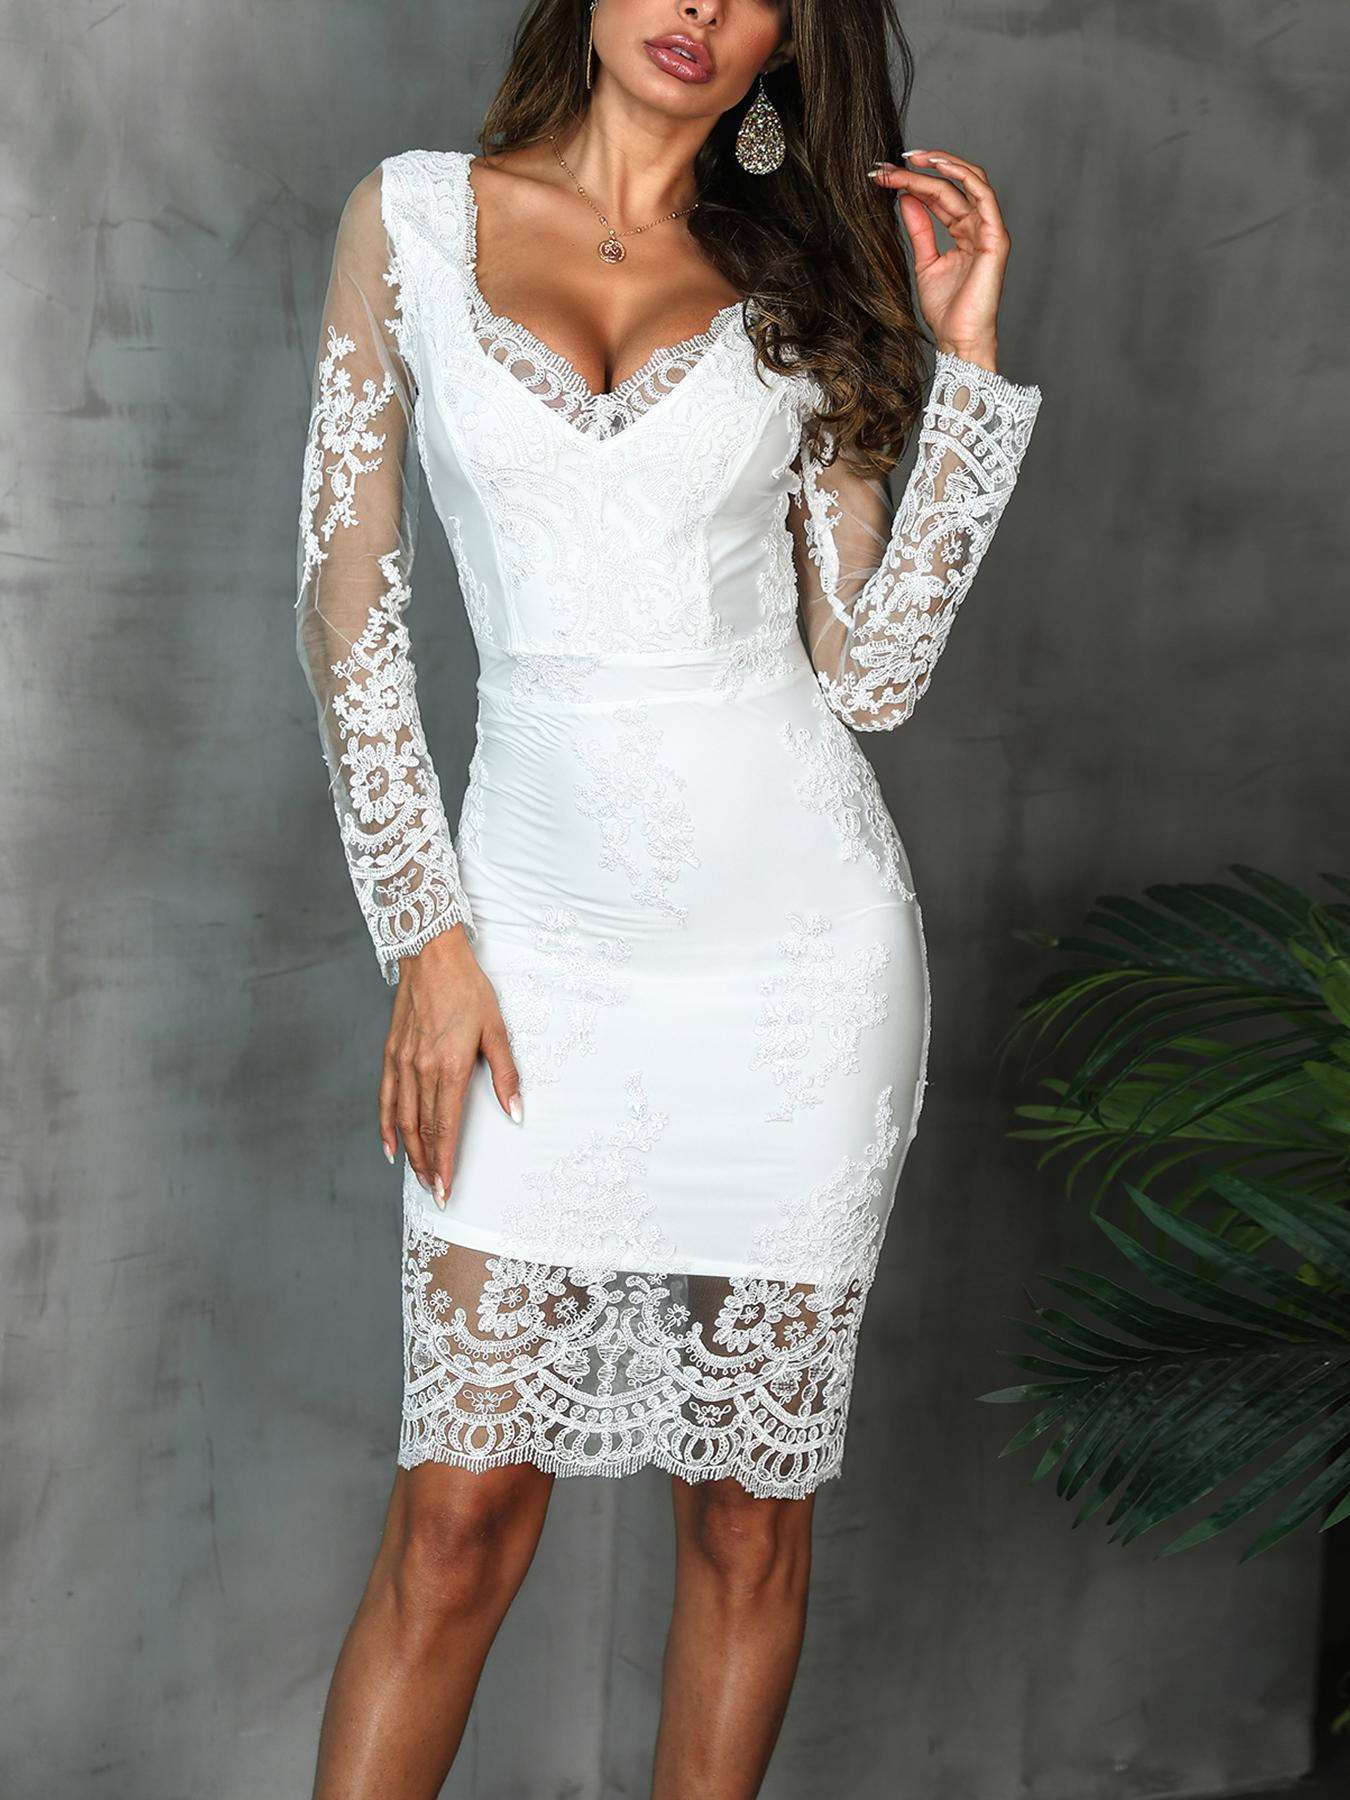 chicme / Bordado Lace Overlay Bodycon Dress